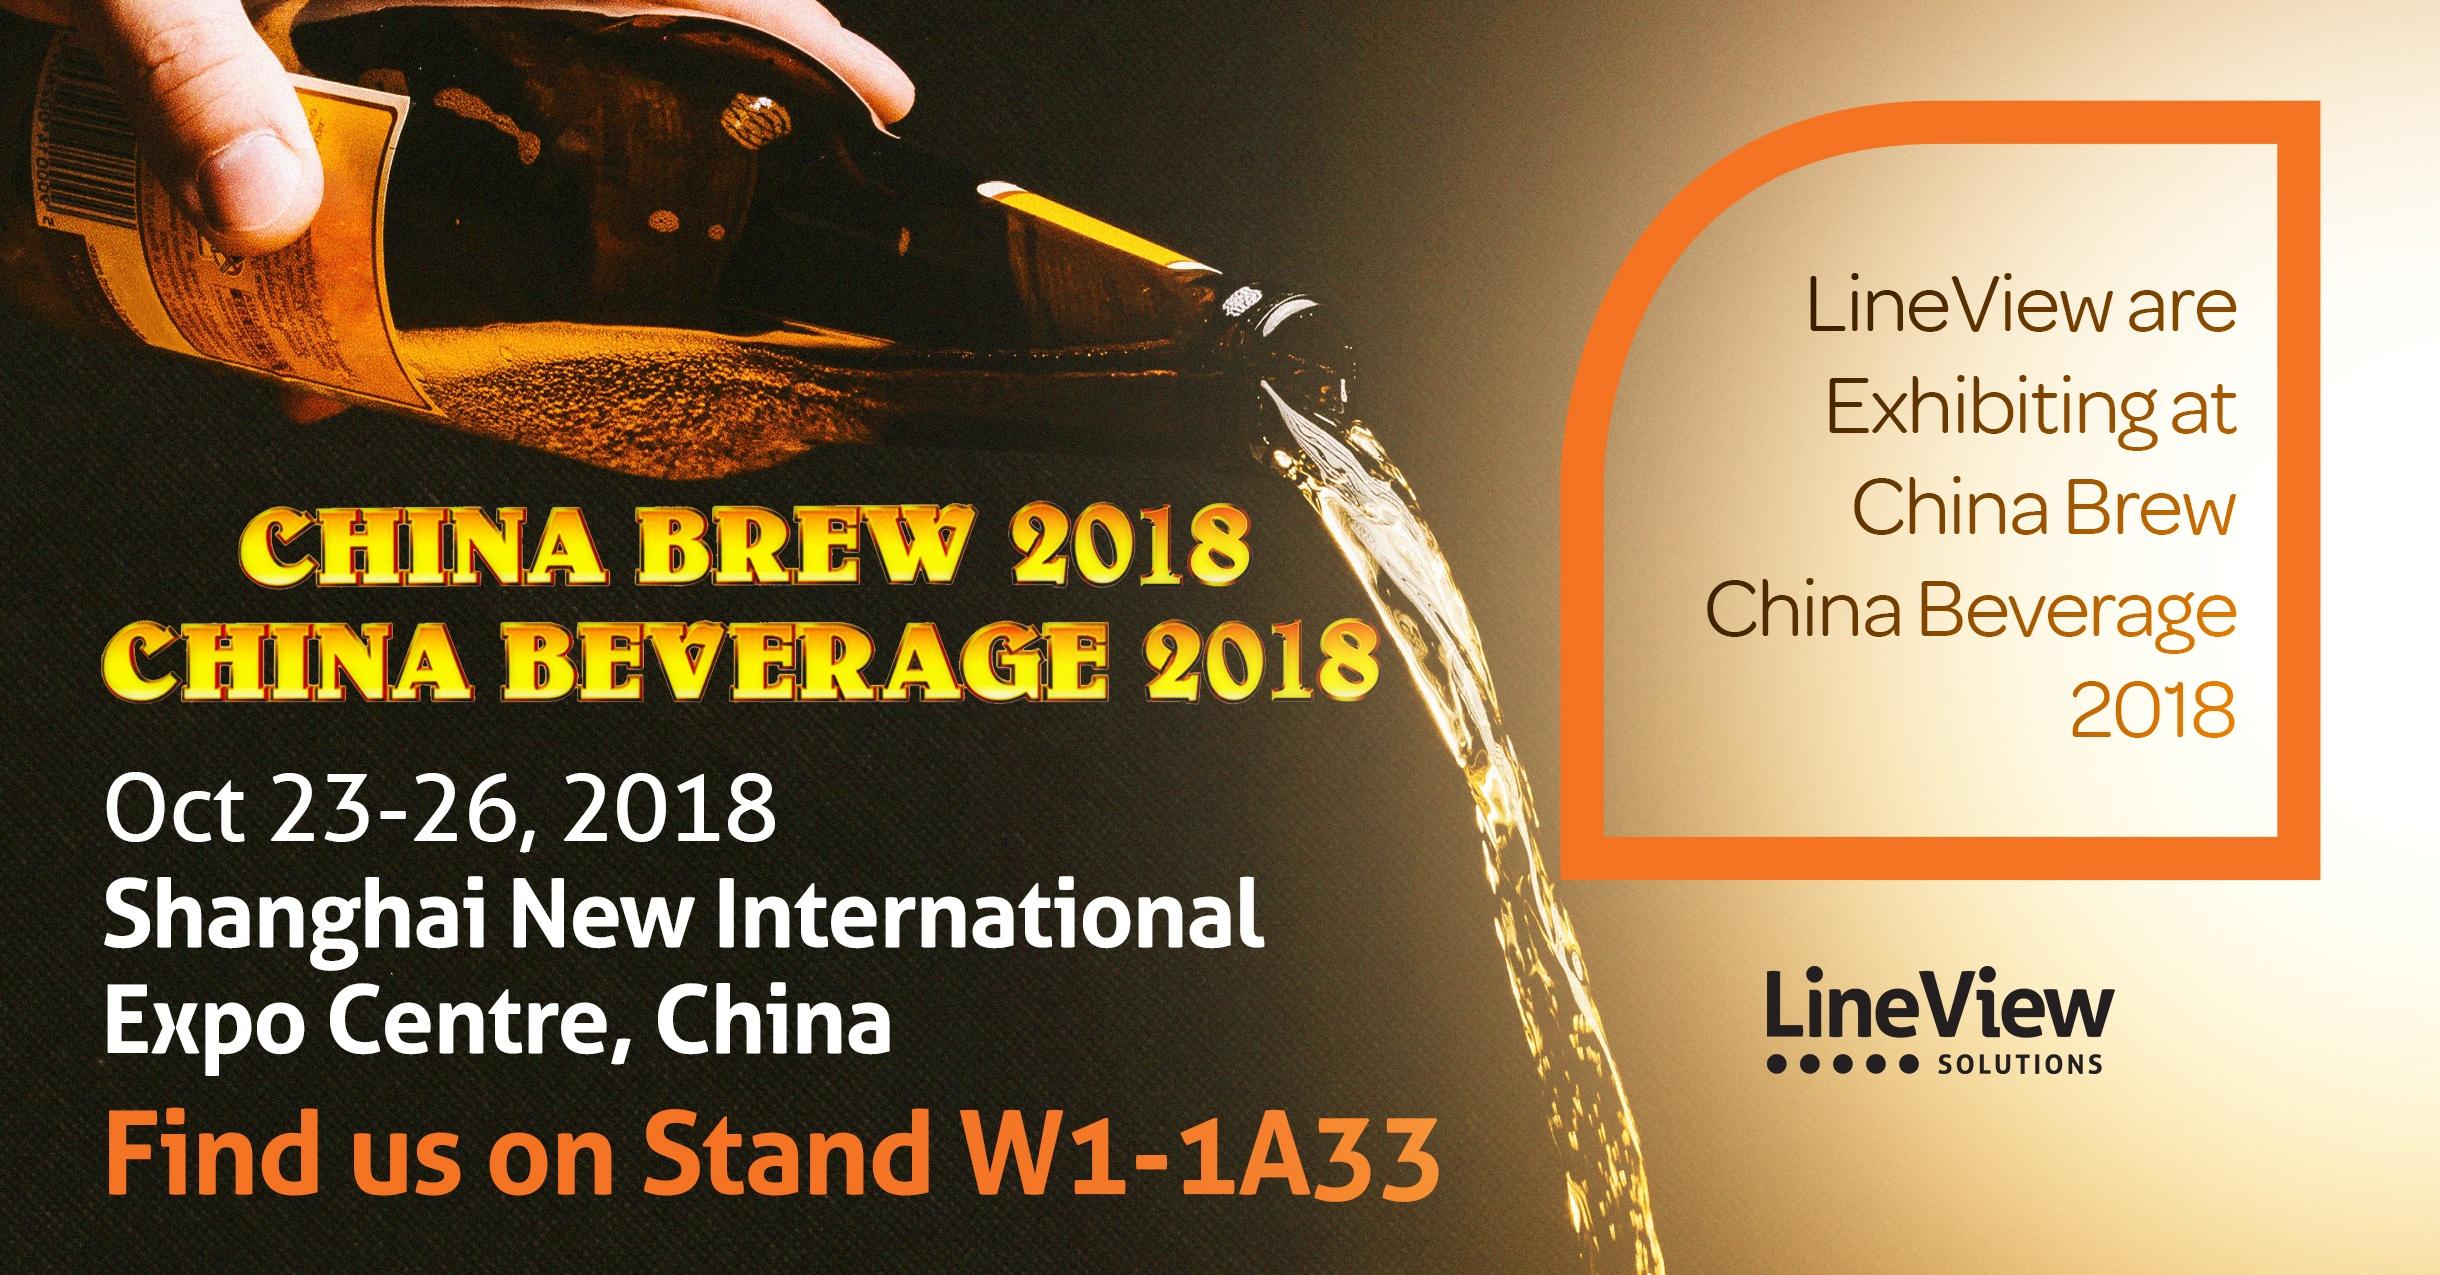 LVS - China Brew China Beverage 2018 (Web Banner).jpg